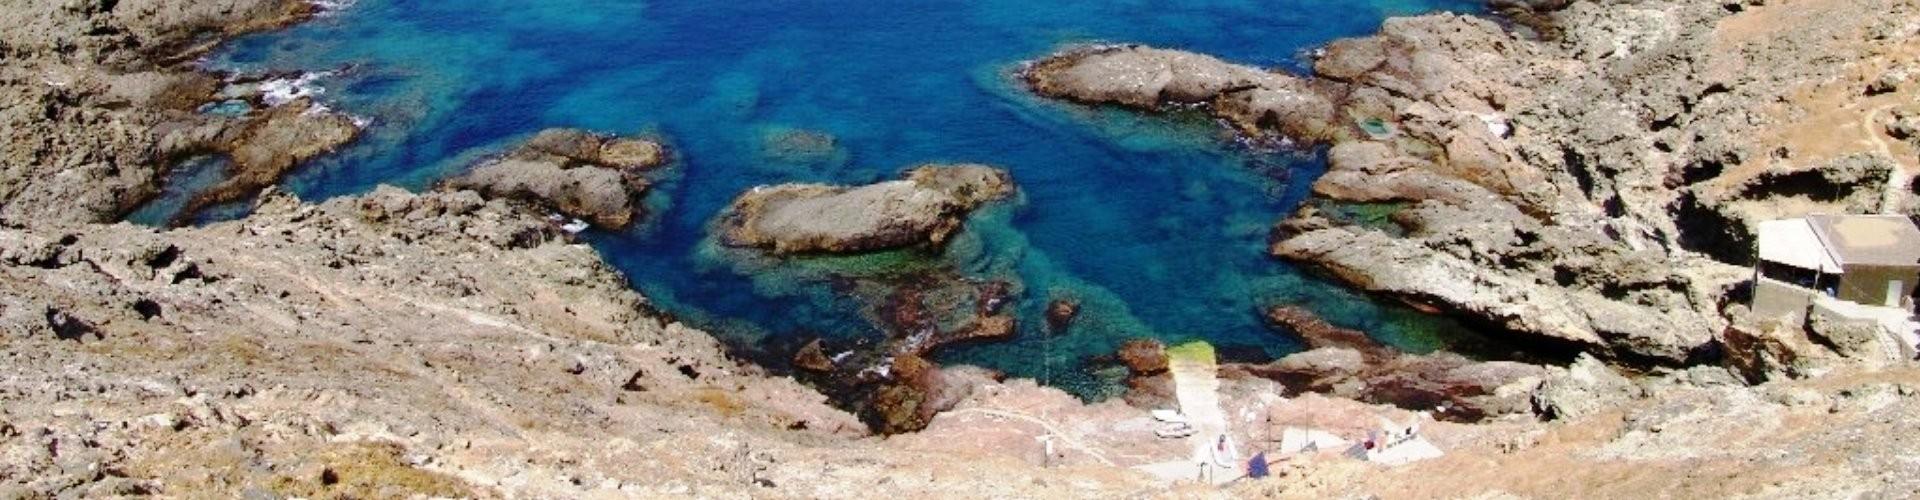 Reserva Natural das ilhas Selvagens Island Nature Reserve, Madeira